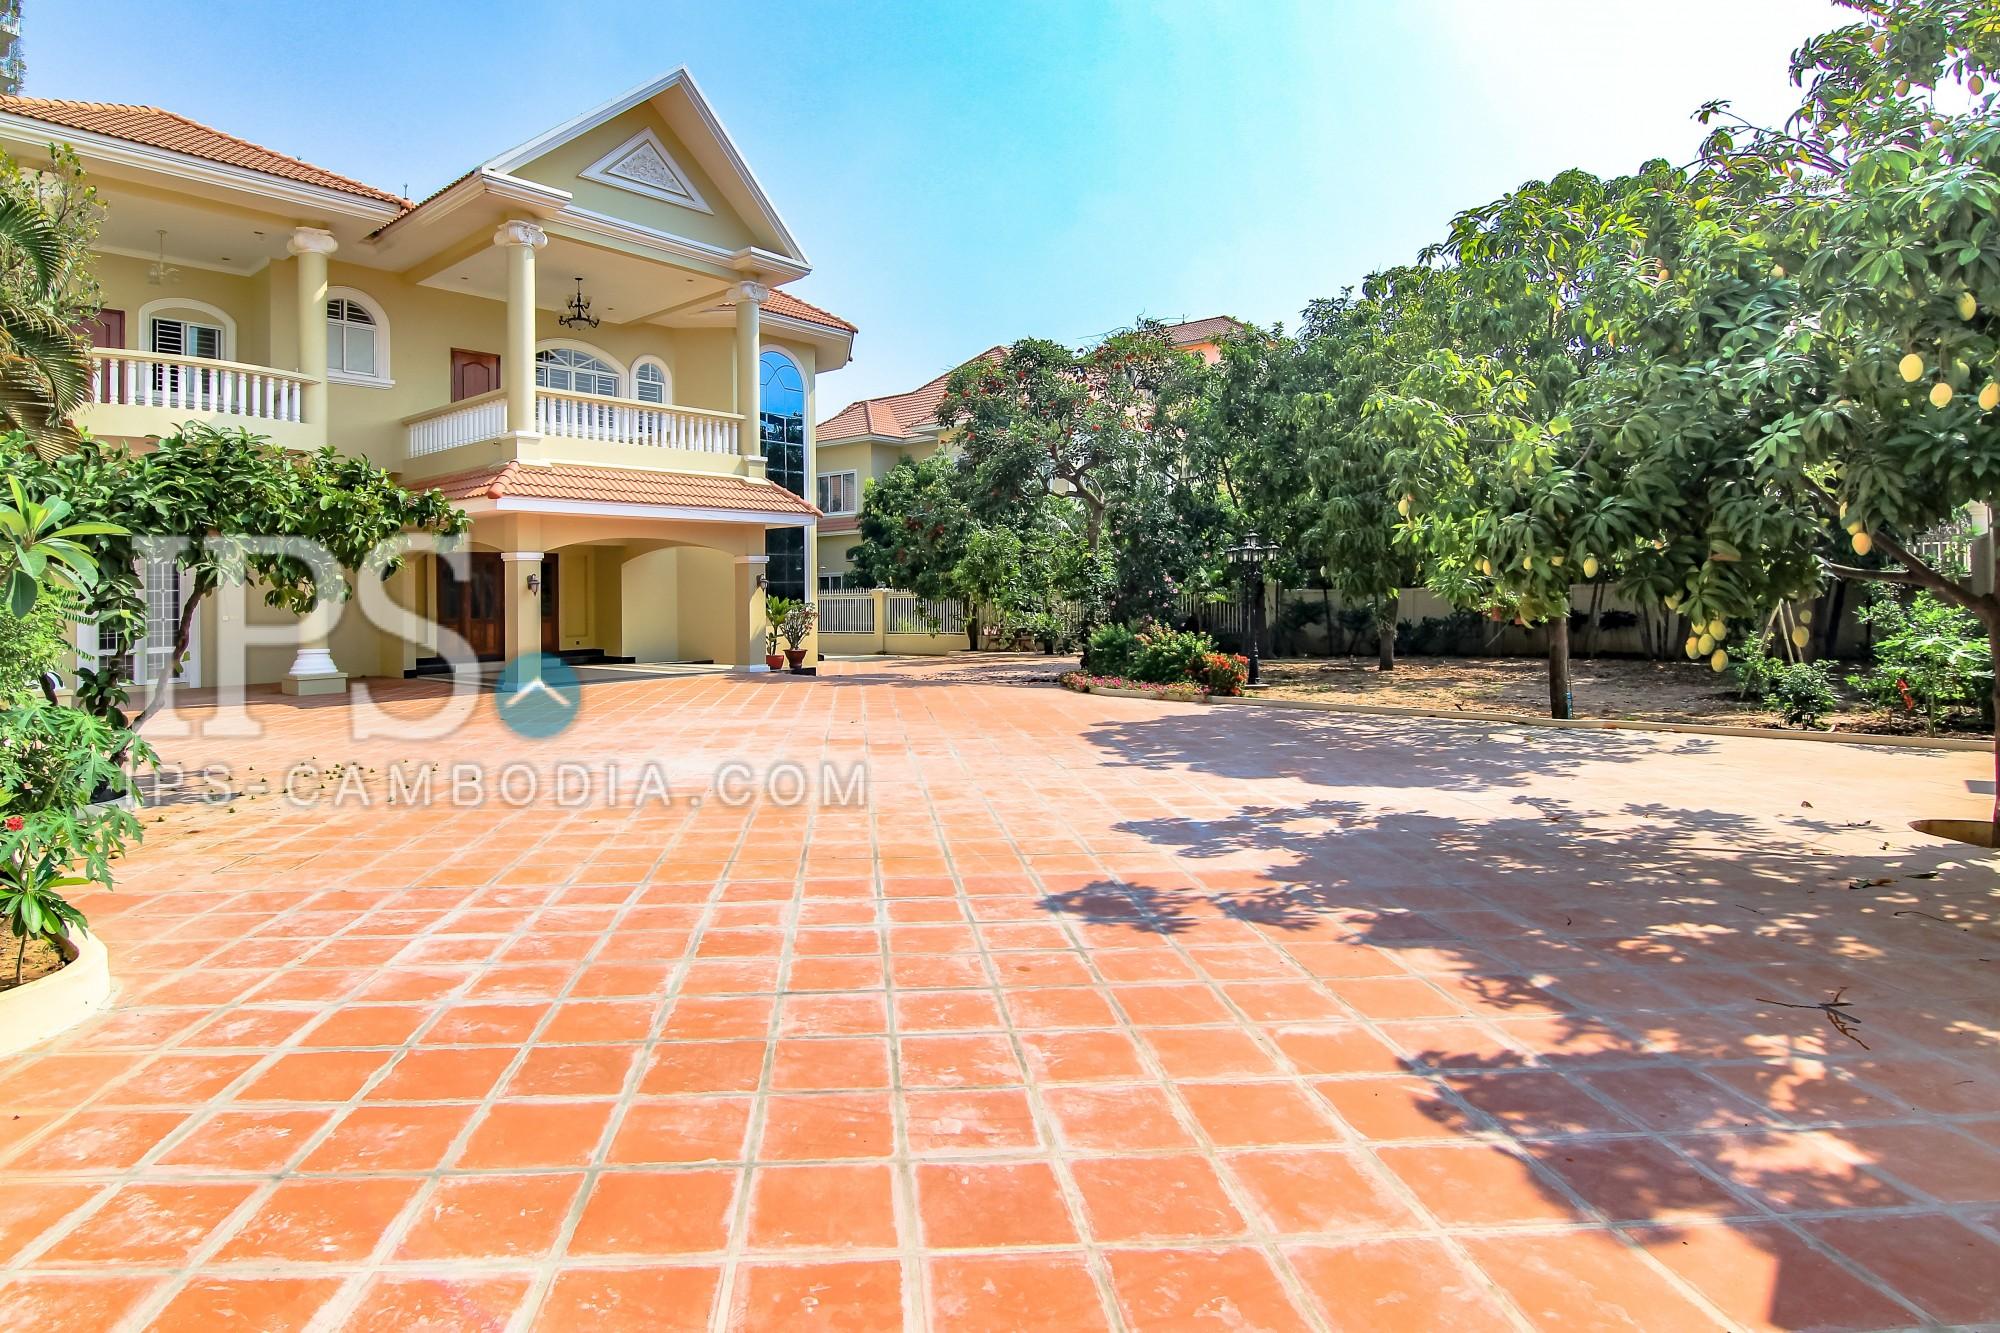 5 Bedroom Villa For Rent - Chroy Changva, Phnom Penh